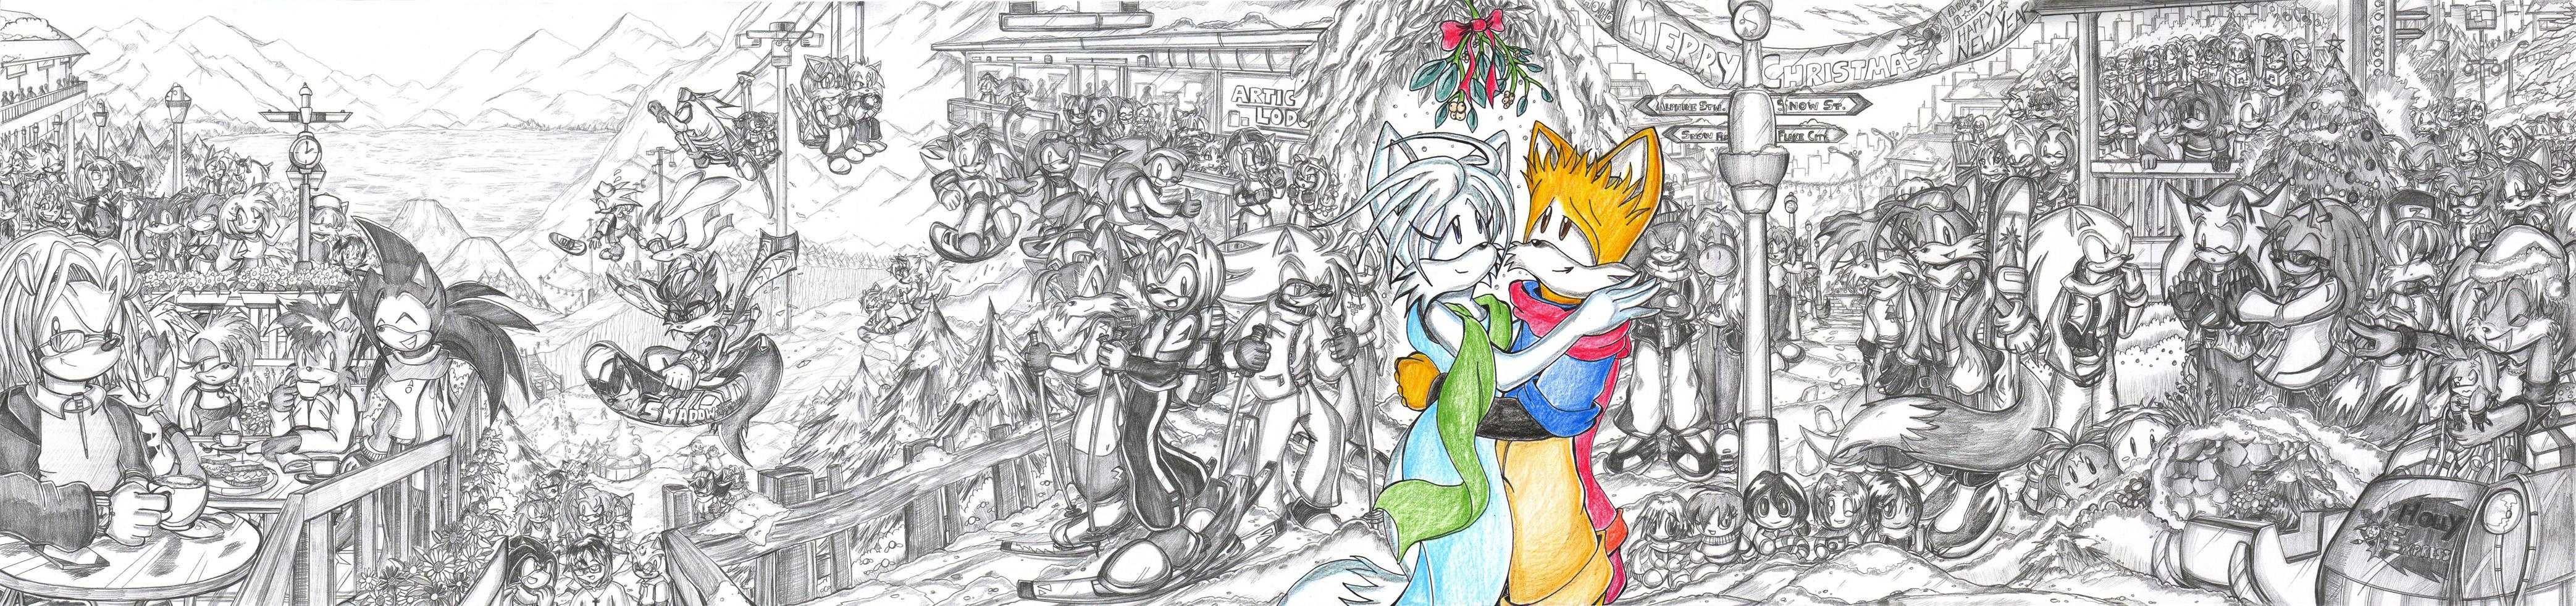 A Merry Christmas Festivity by darkspeeds